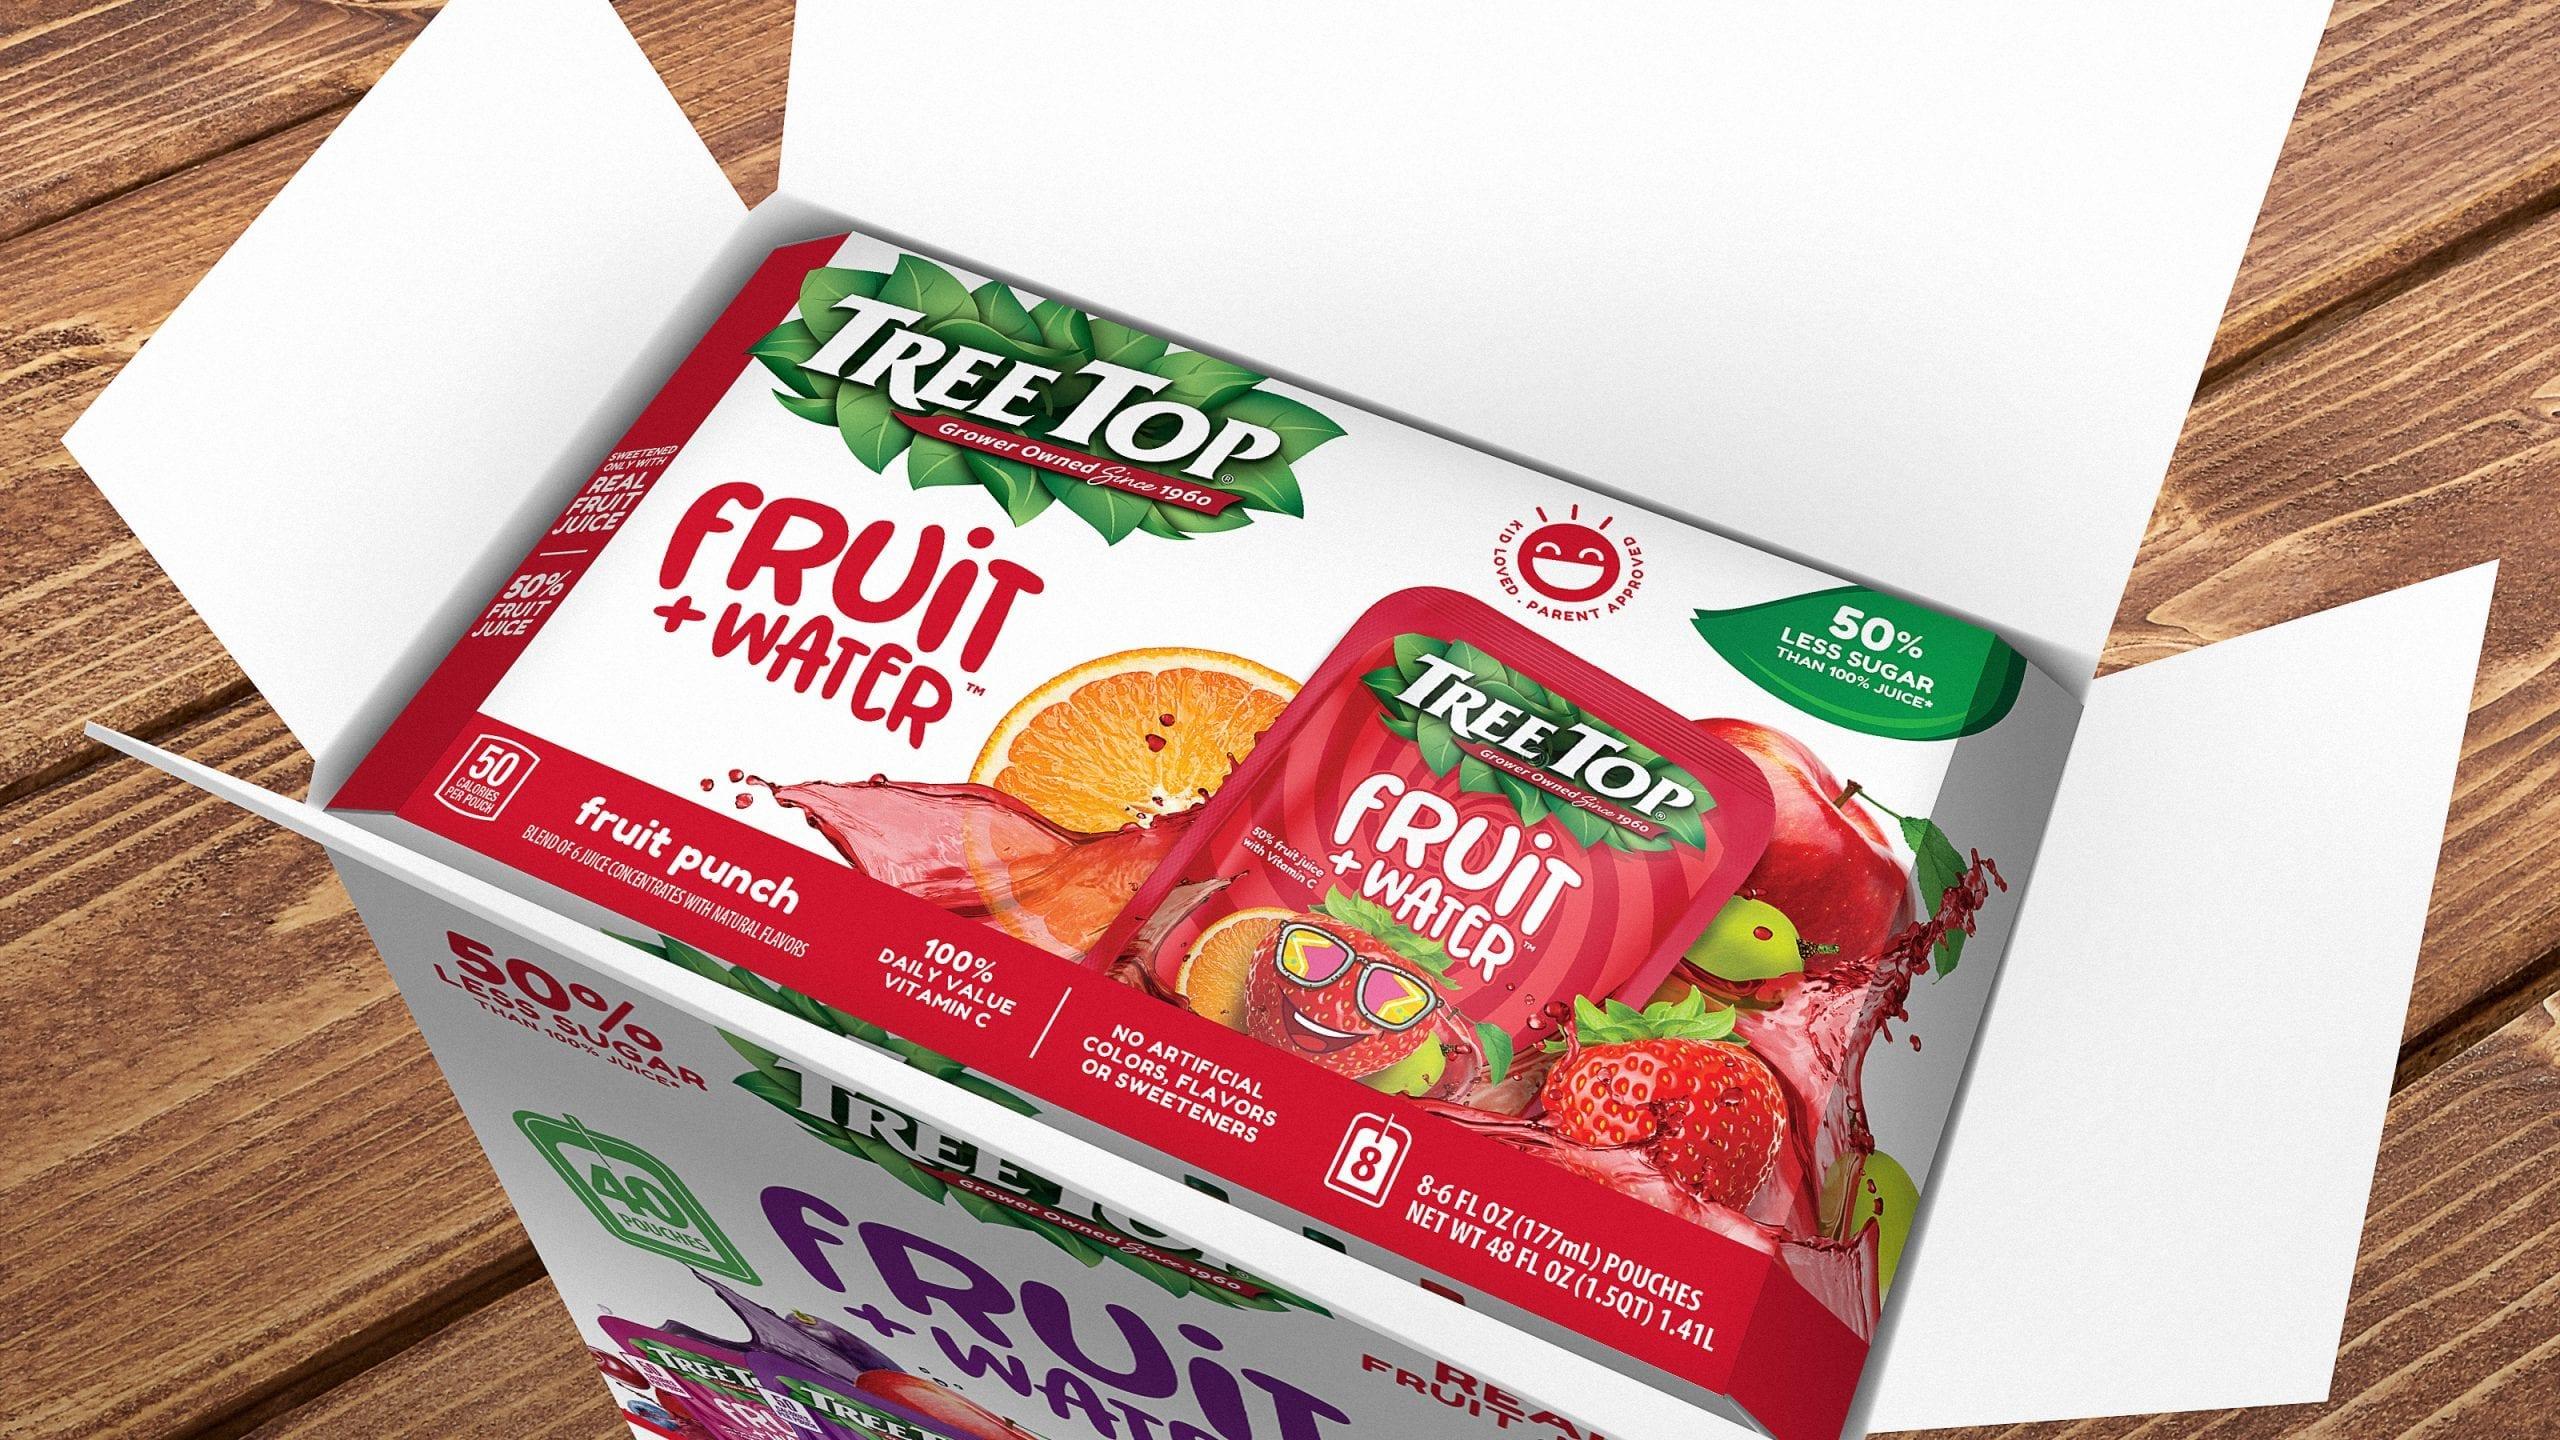 treetop box packaging design